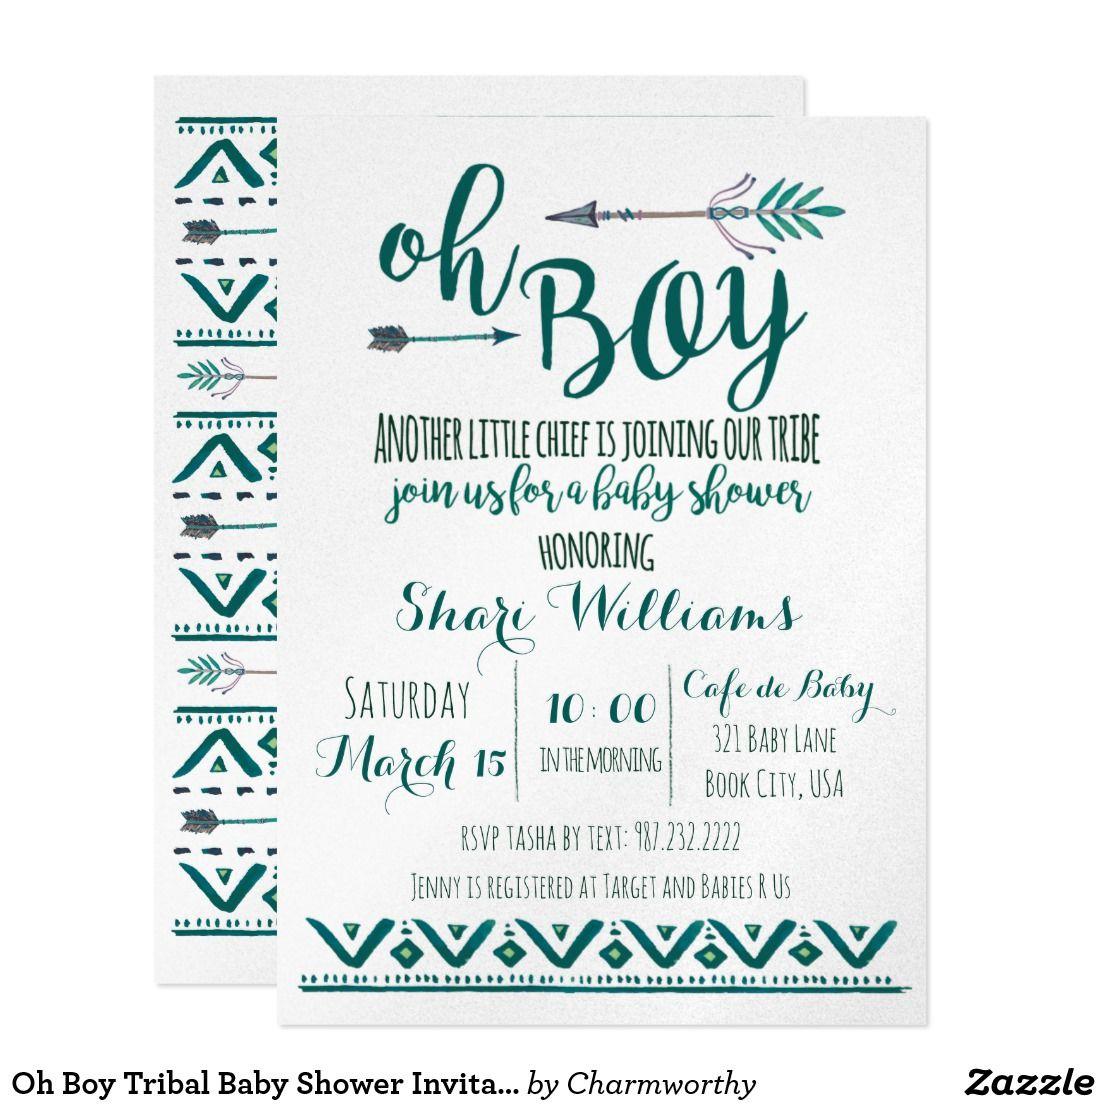 Oh Boy Tribal Baby Shower Invitation -Green | Tribal baby shower ...